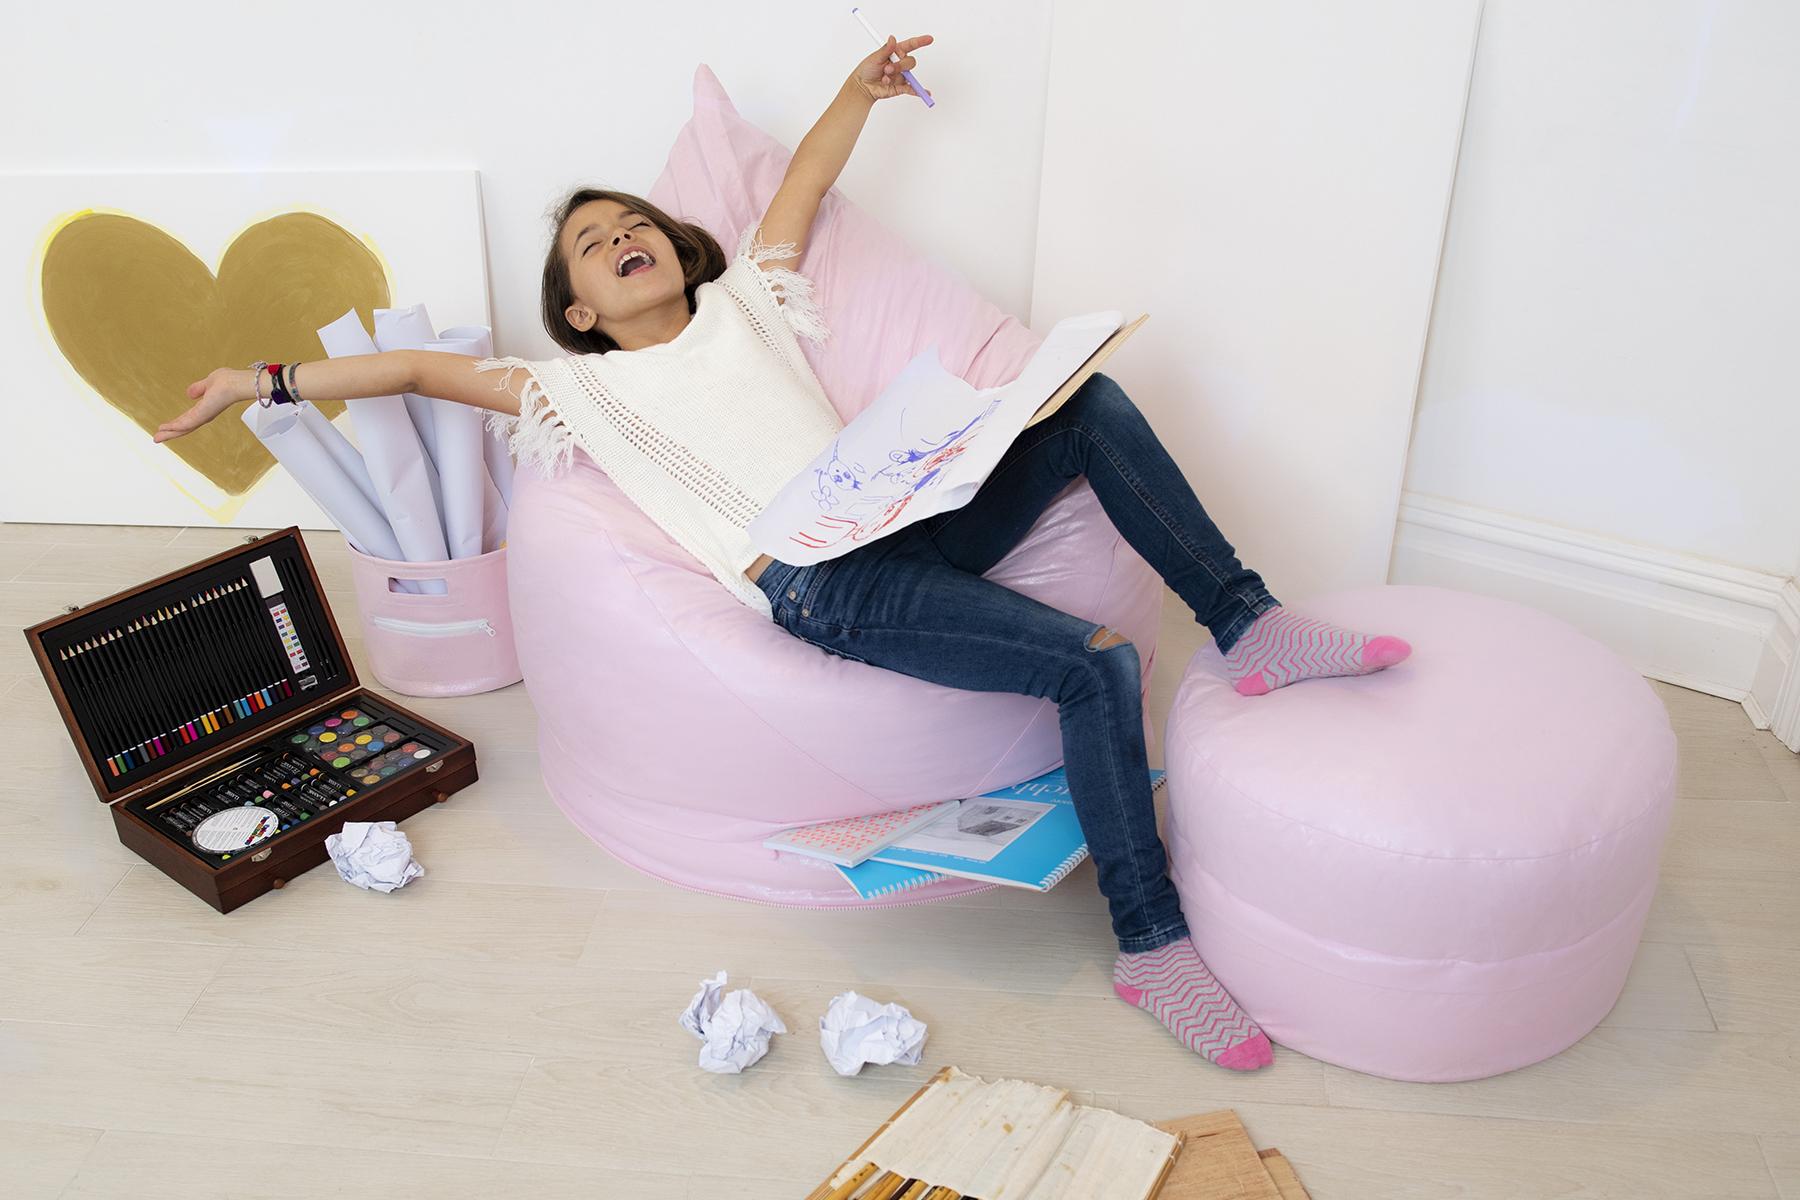 Mimish Design - Representing love of design, comfort, function, and fun.